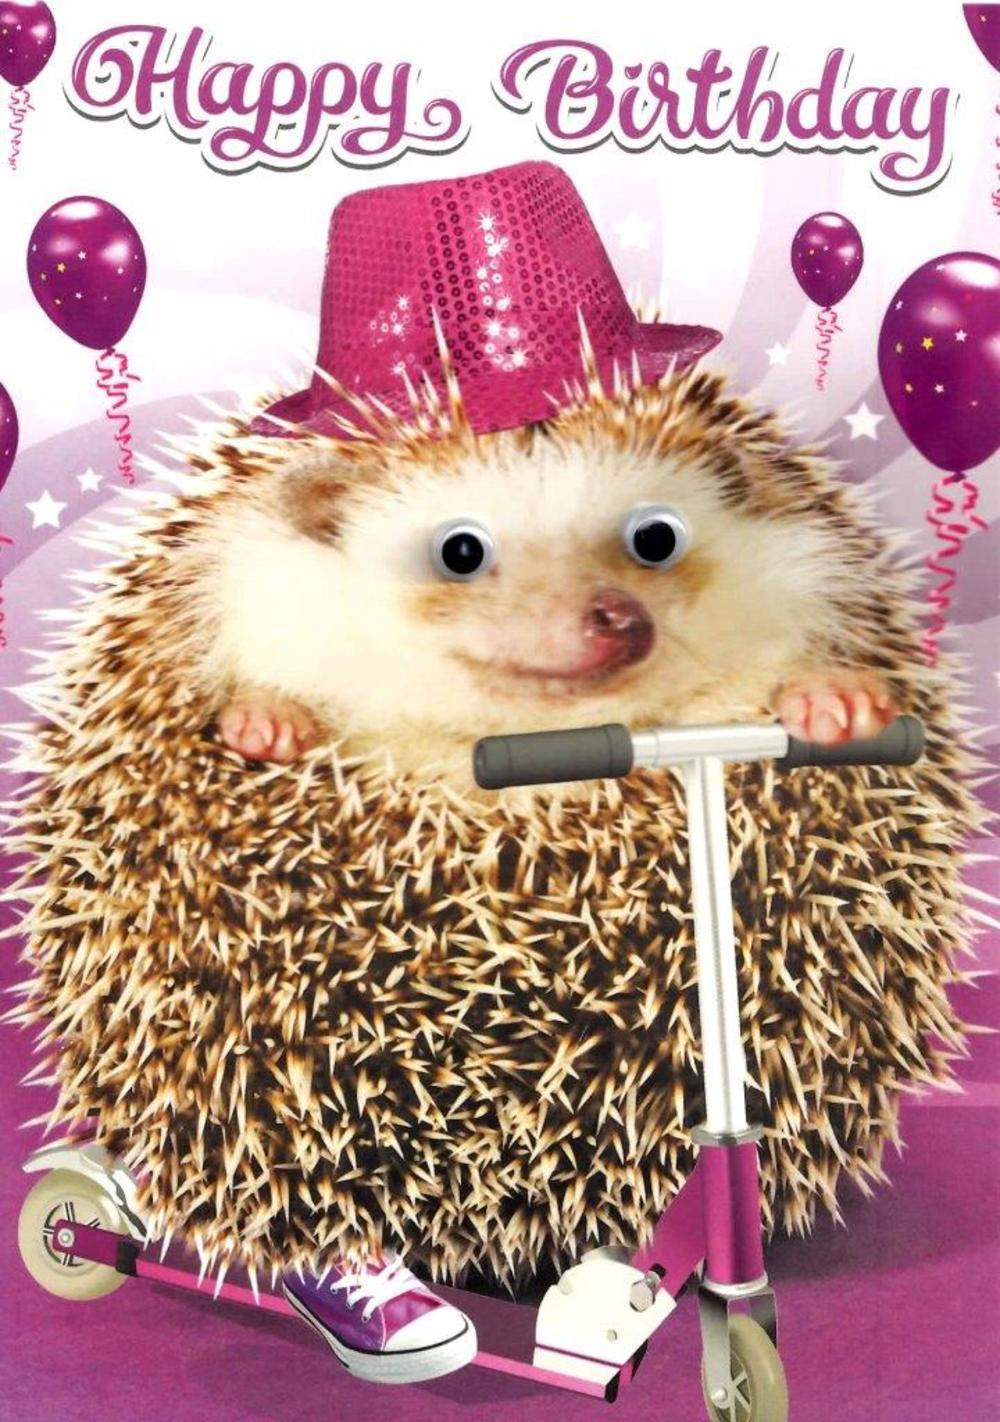 Scooting Hedgehog Googlies Birthday Card